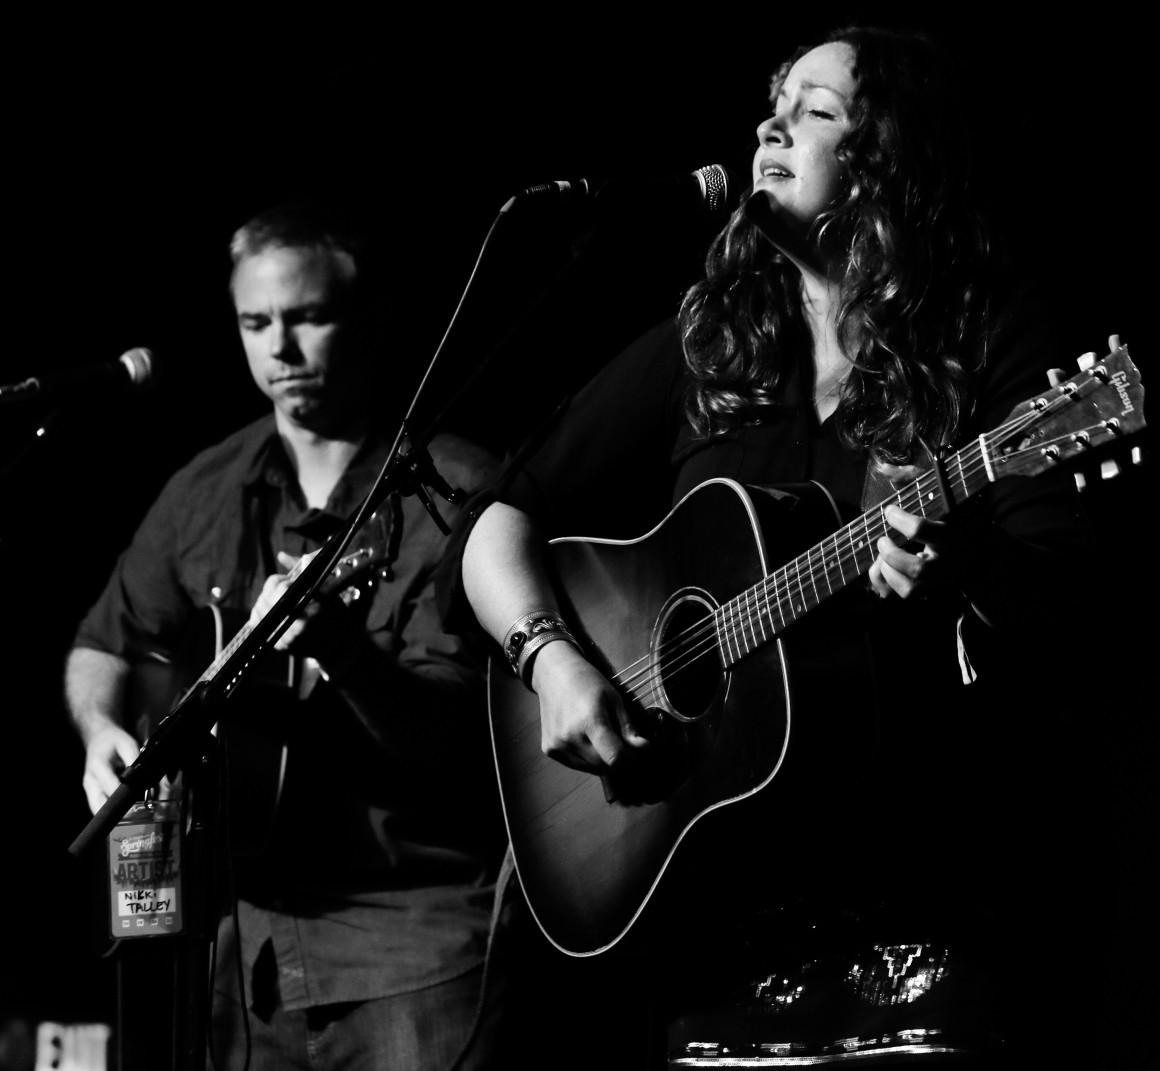 Jason Sharp & Nikki Talley. Photo by Brian Hensley